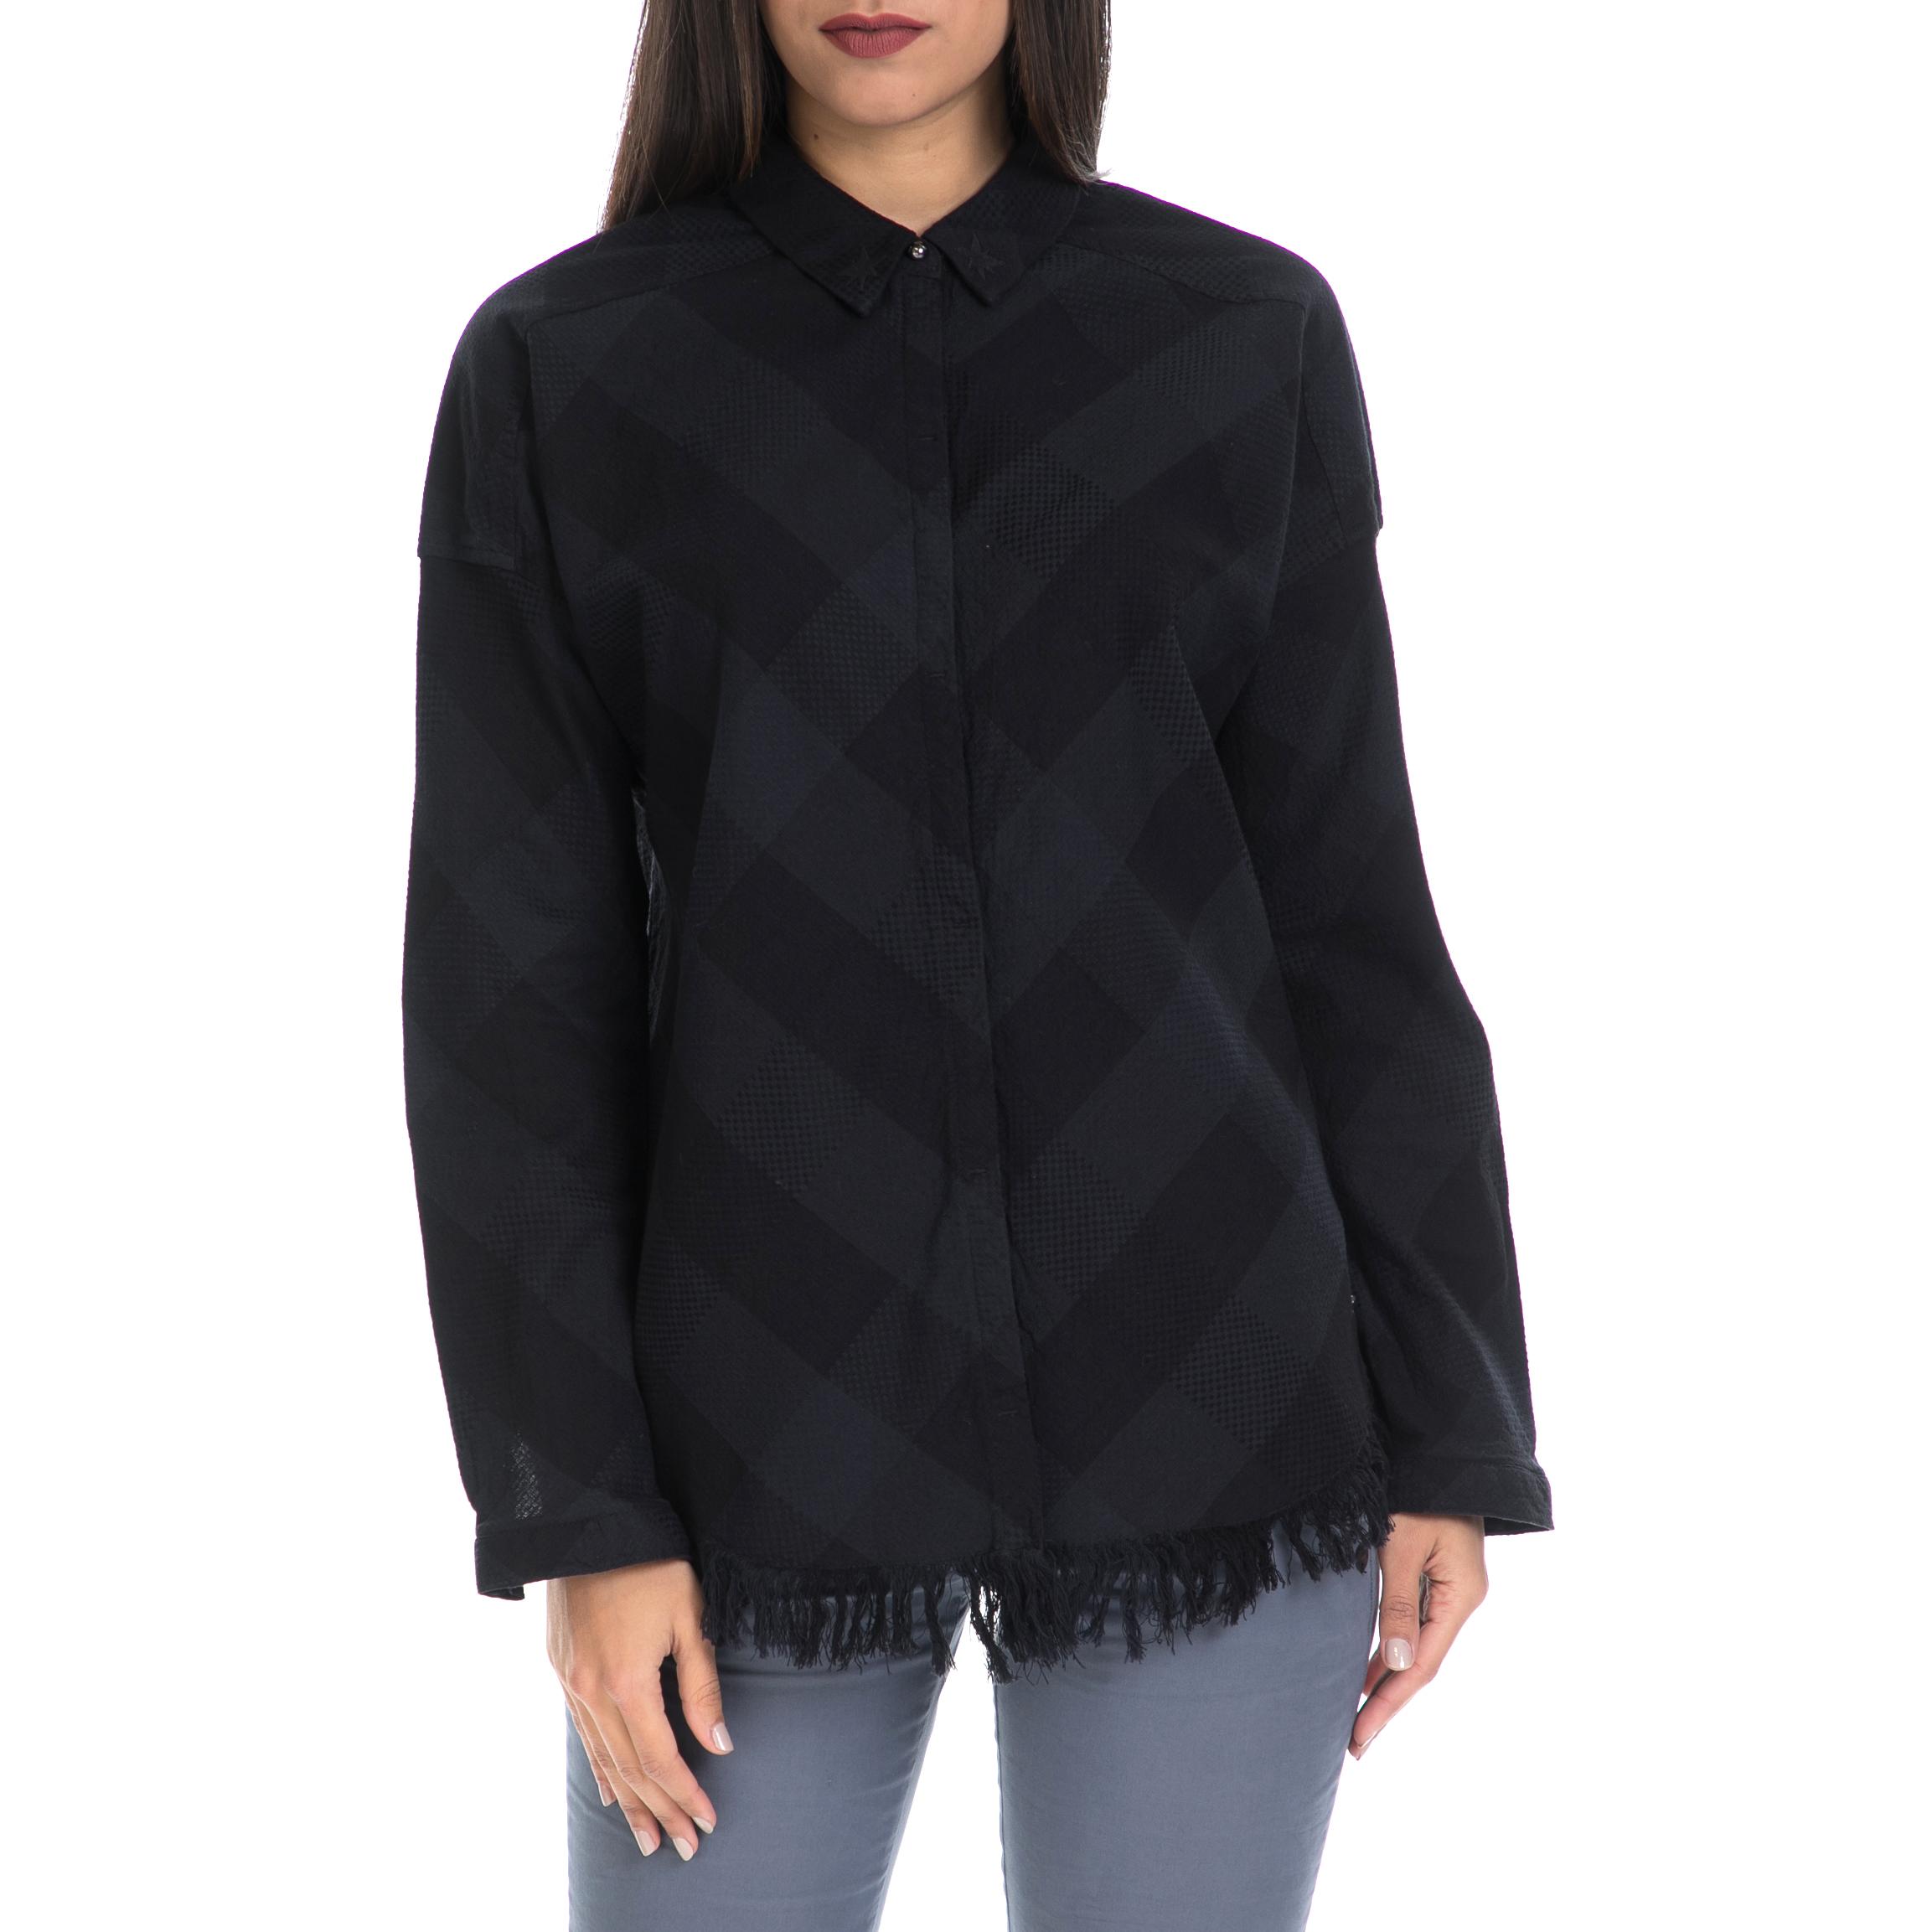 MAISON SCOTCH – Γυναικείο πουκάμισο MAISON SCOTCH μαύρο